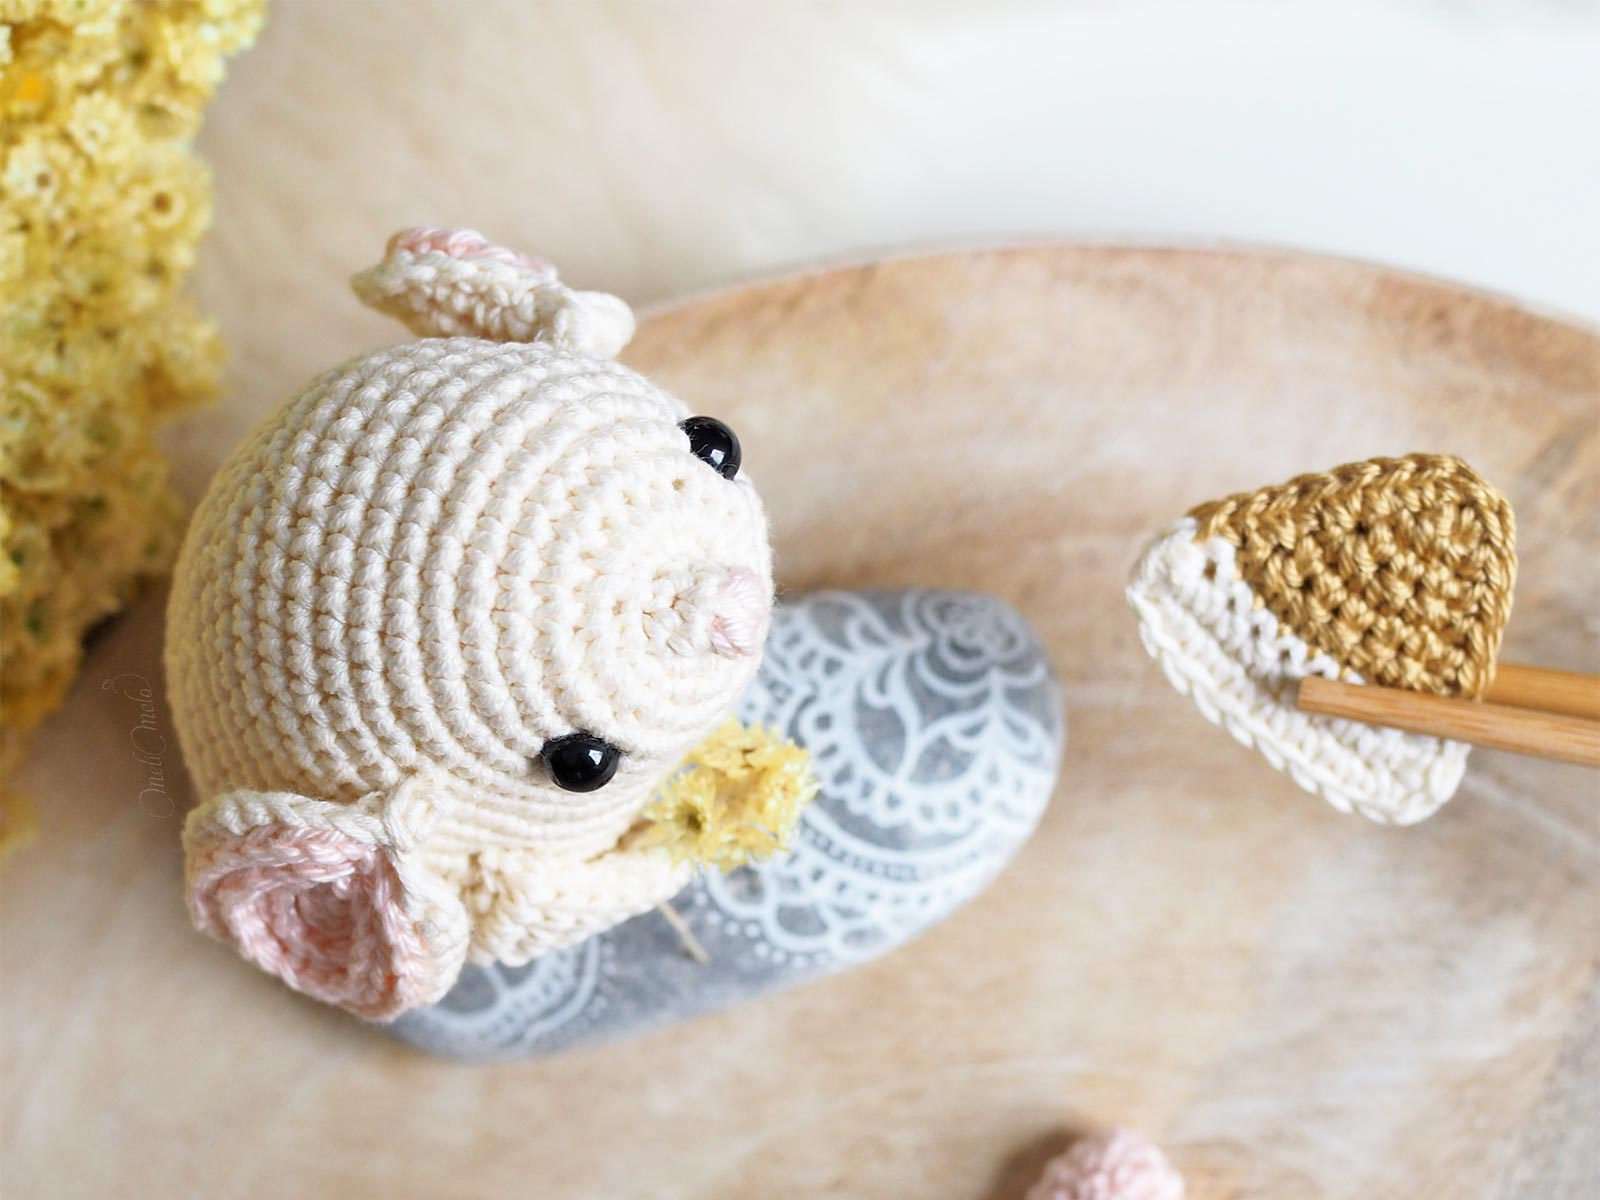 crochet amigurumi souris DMC Natura coton Boutique MeliMelo